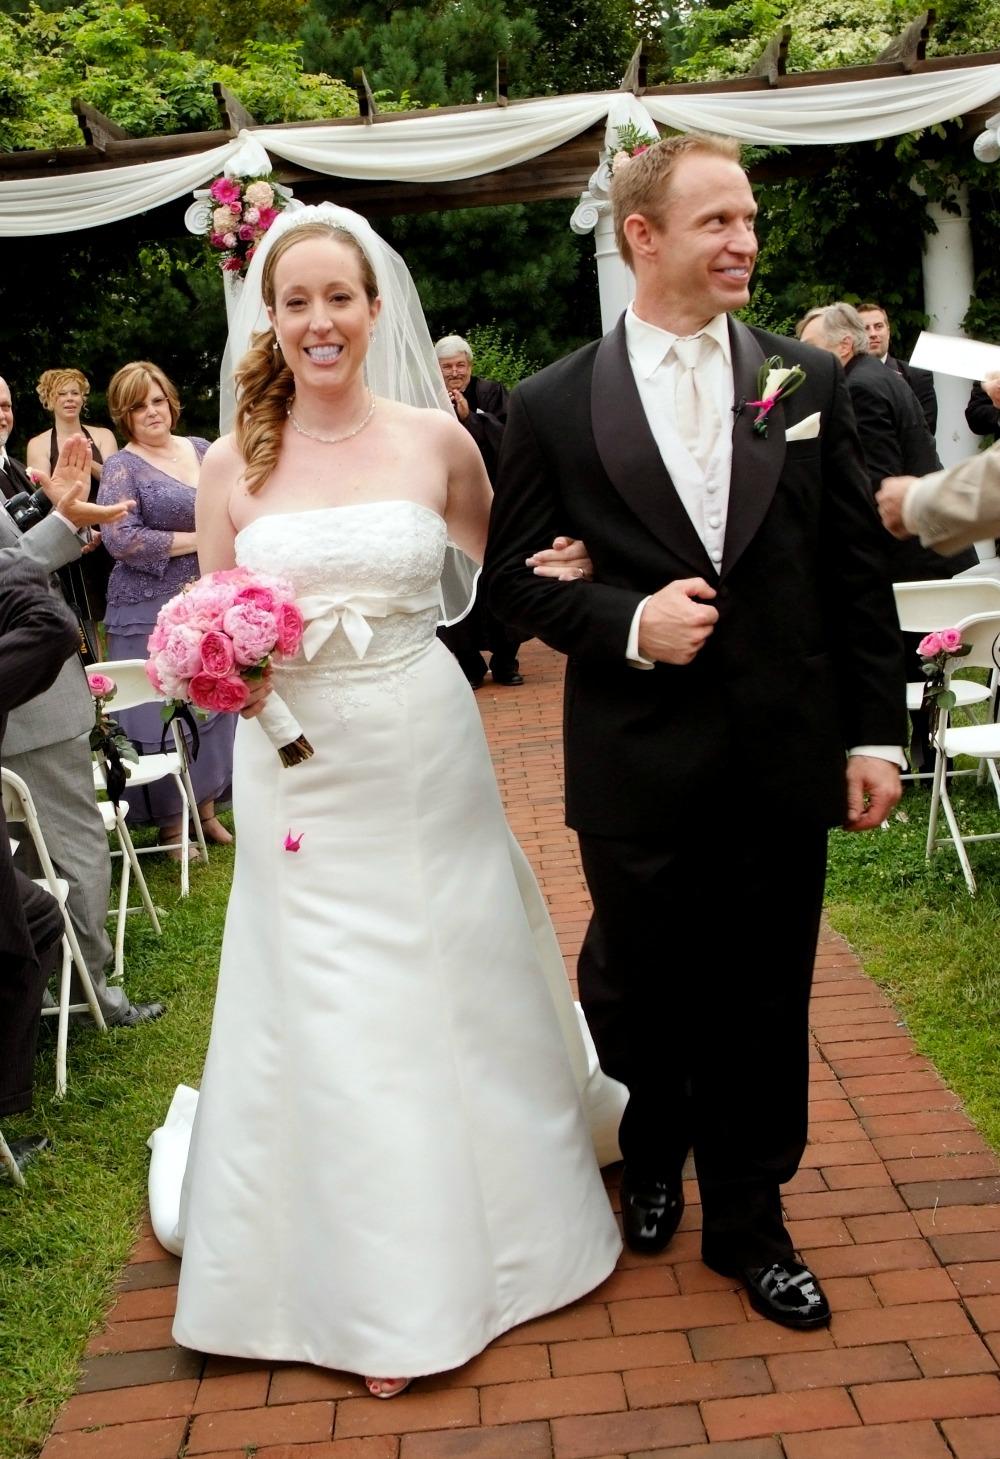 Get back your wedding day smiles #OpticSmiles #CollectiveBias #ad